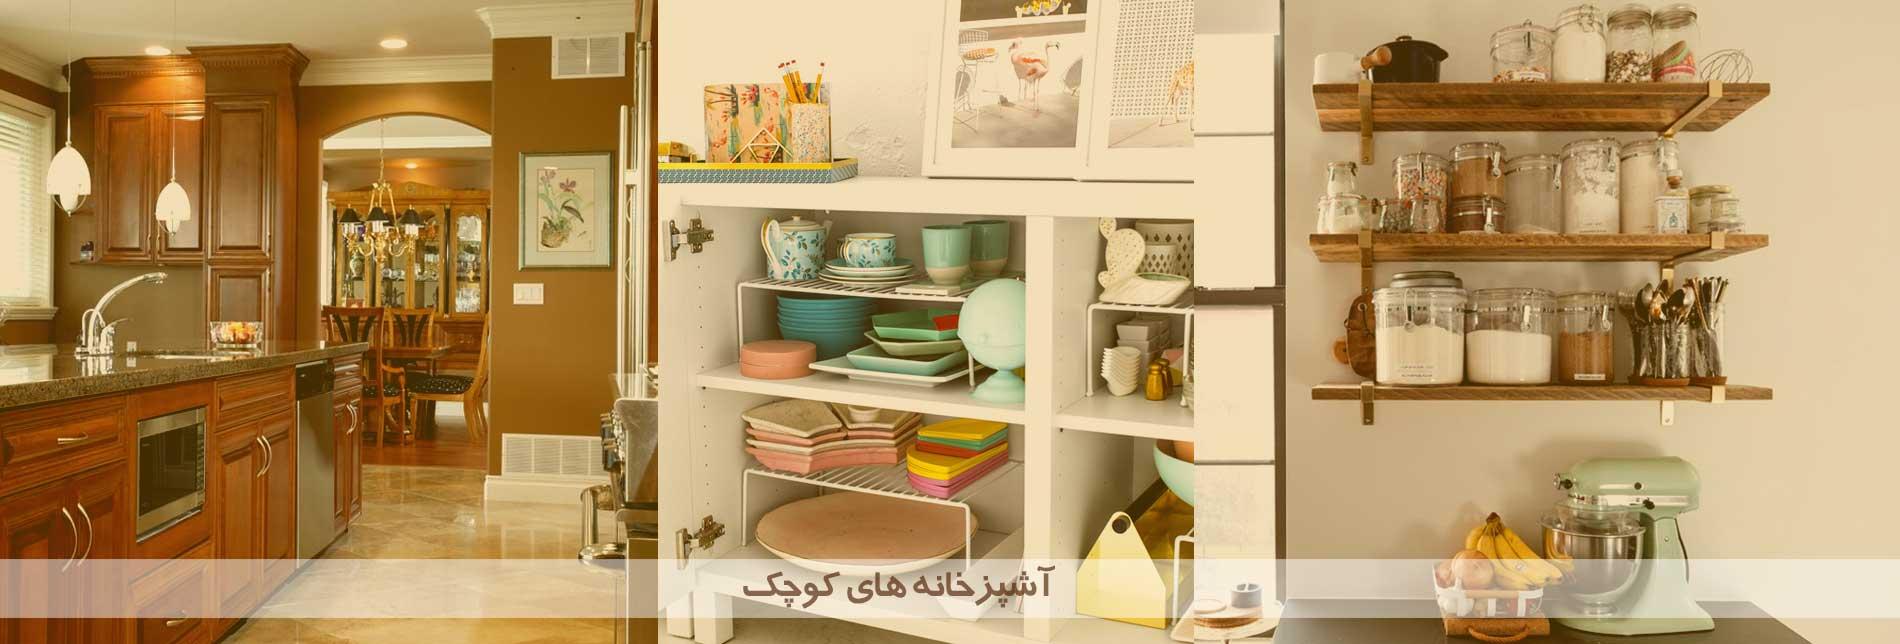 tiny kitchen s2 - آشپزخانه های کوچک اما مرتب